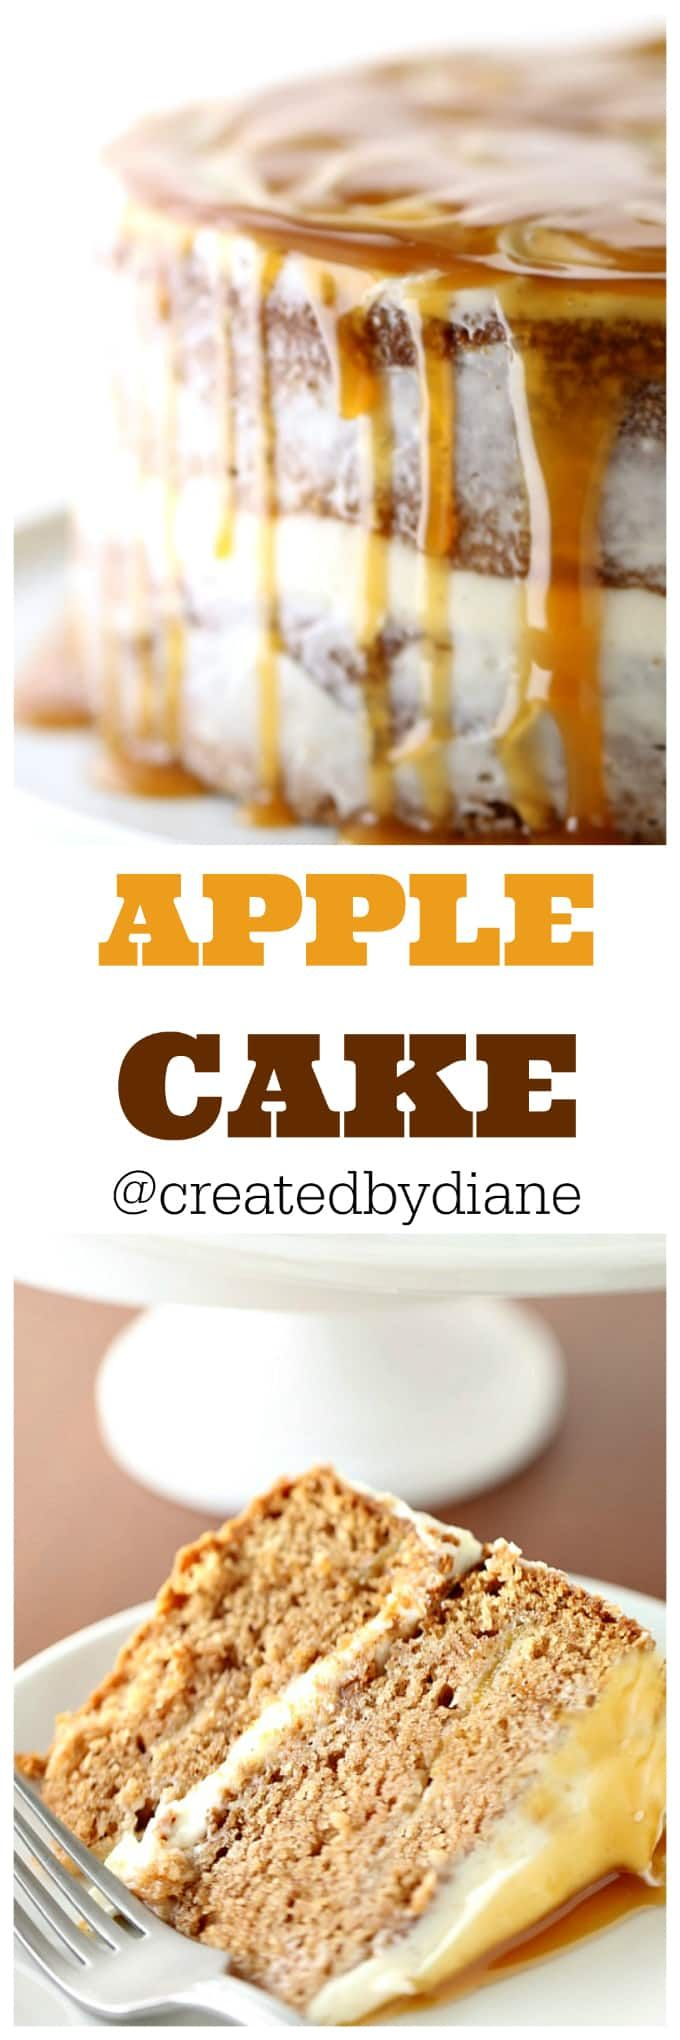 apple-cake-recipe @createdbydiane